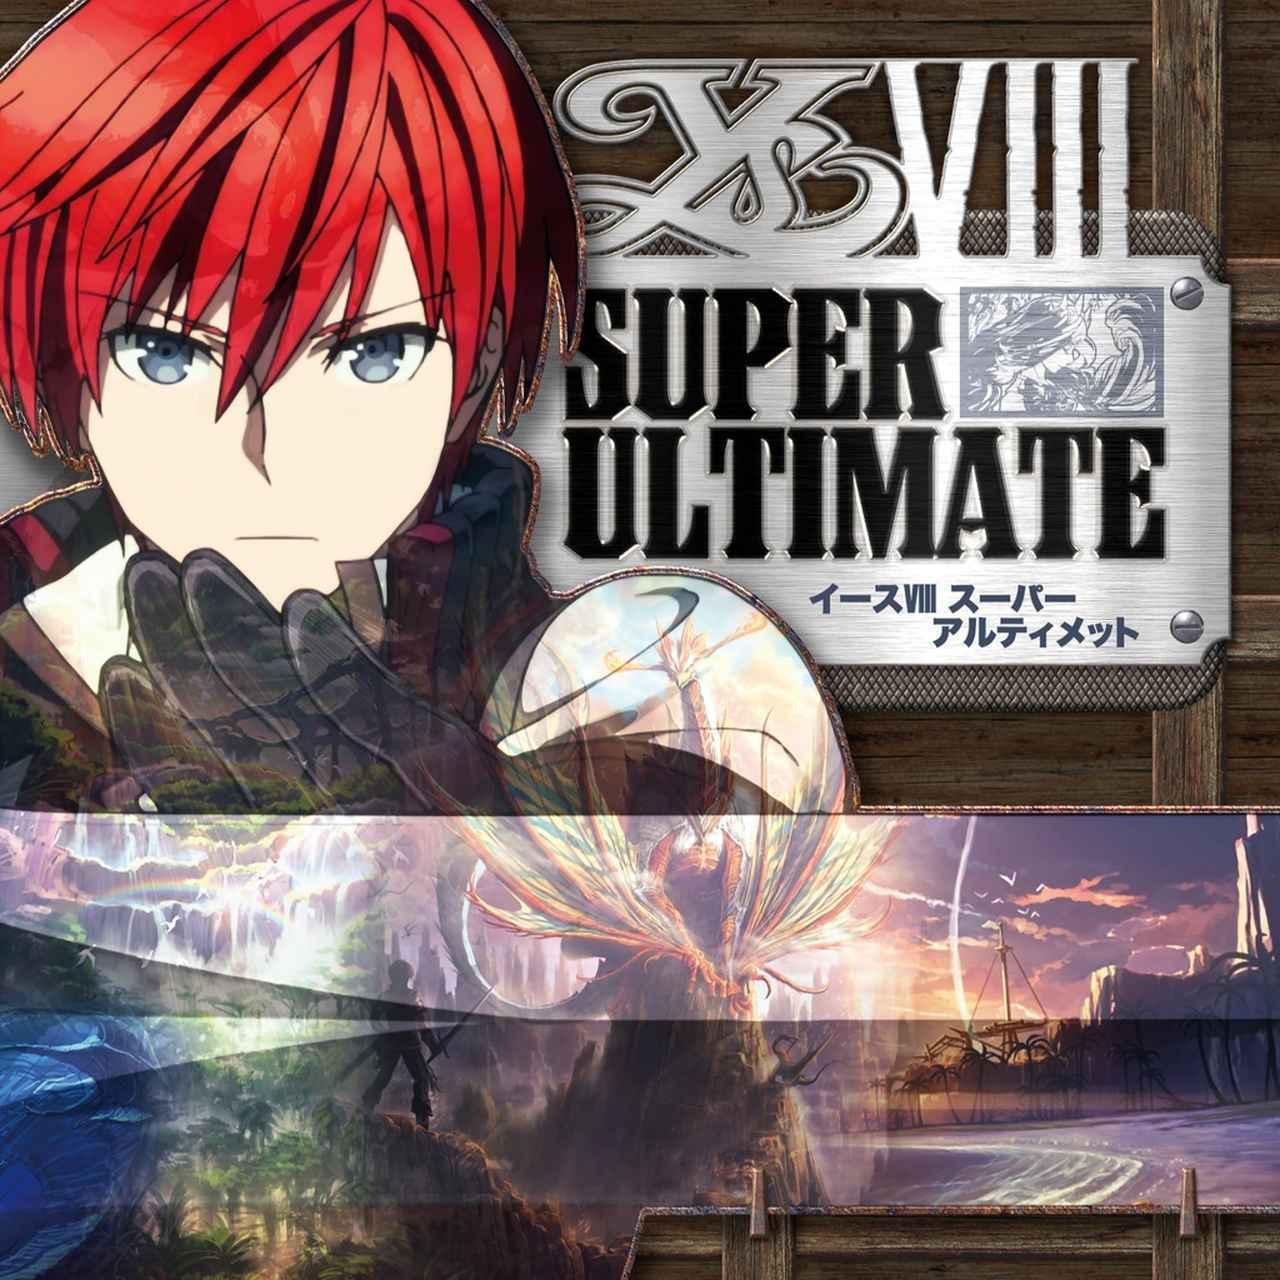 画像: Ys VIII SUPER ULTIMATE / Falcom Sound Team jdk